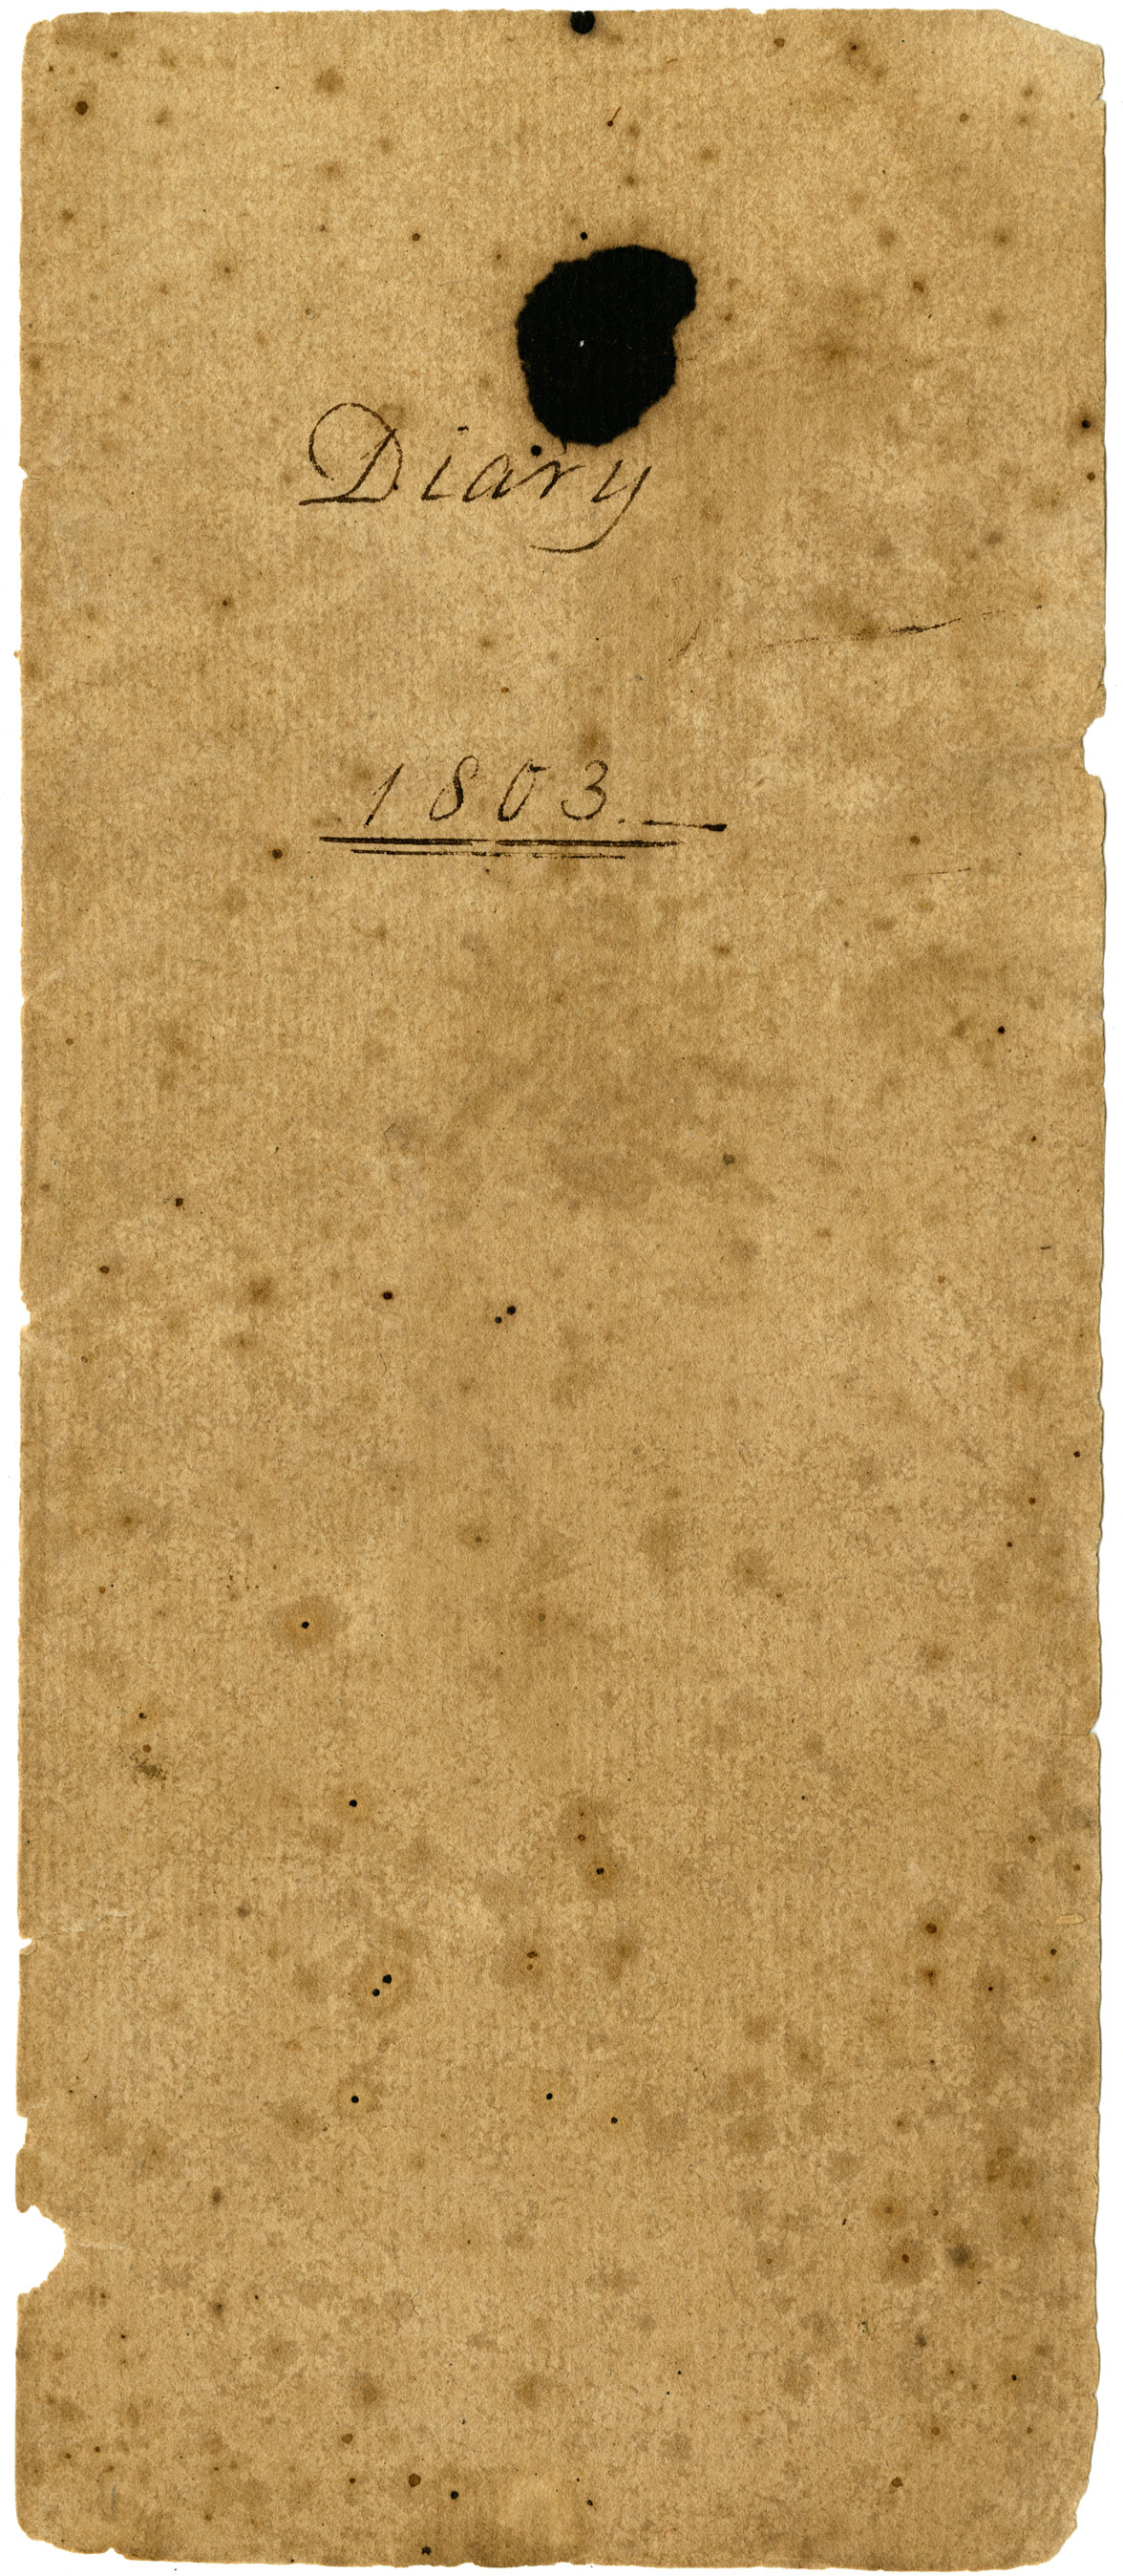 Page 108 - Diary 1803